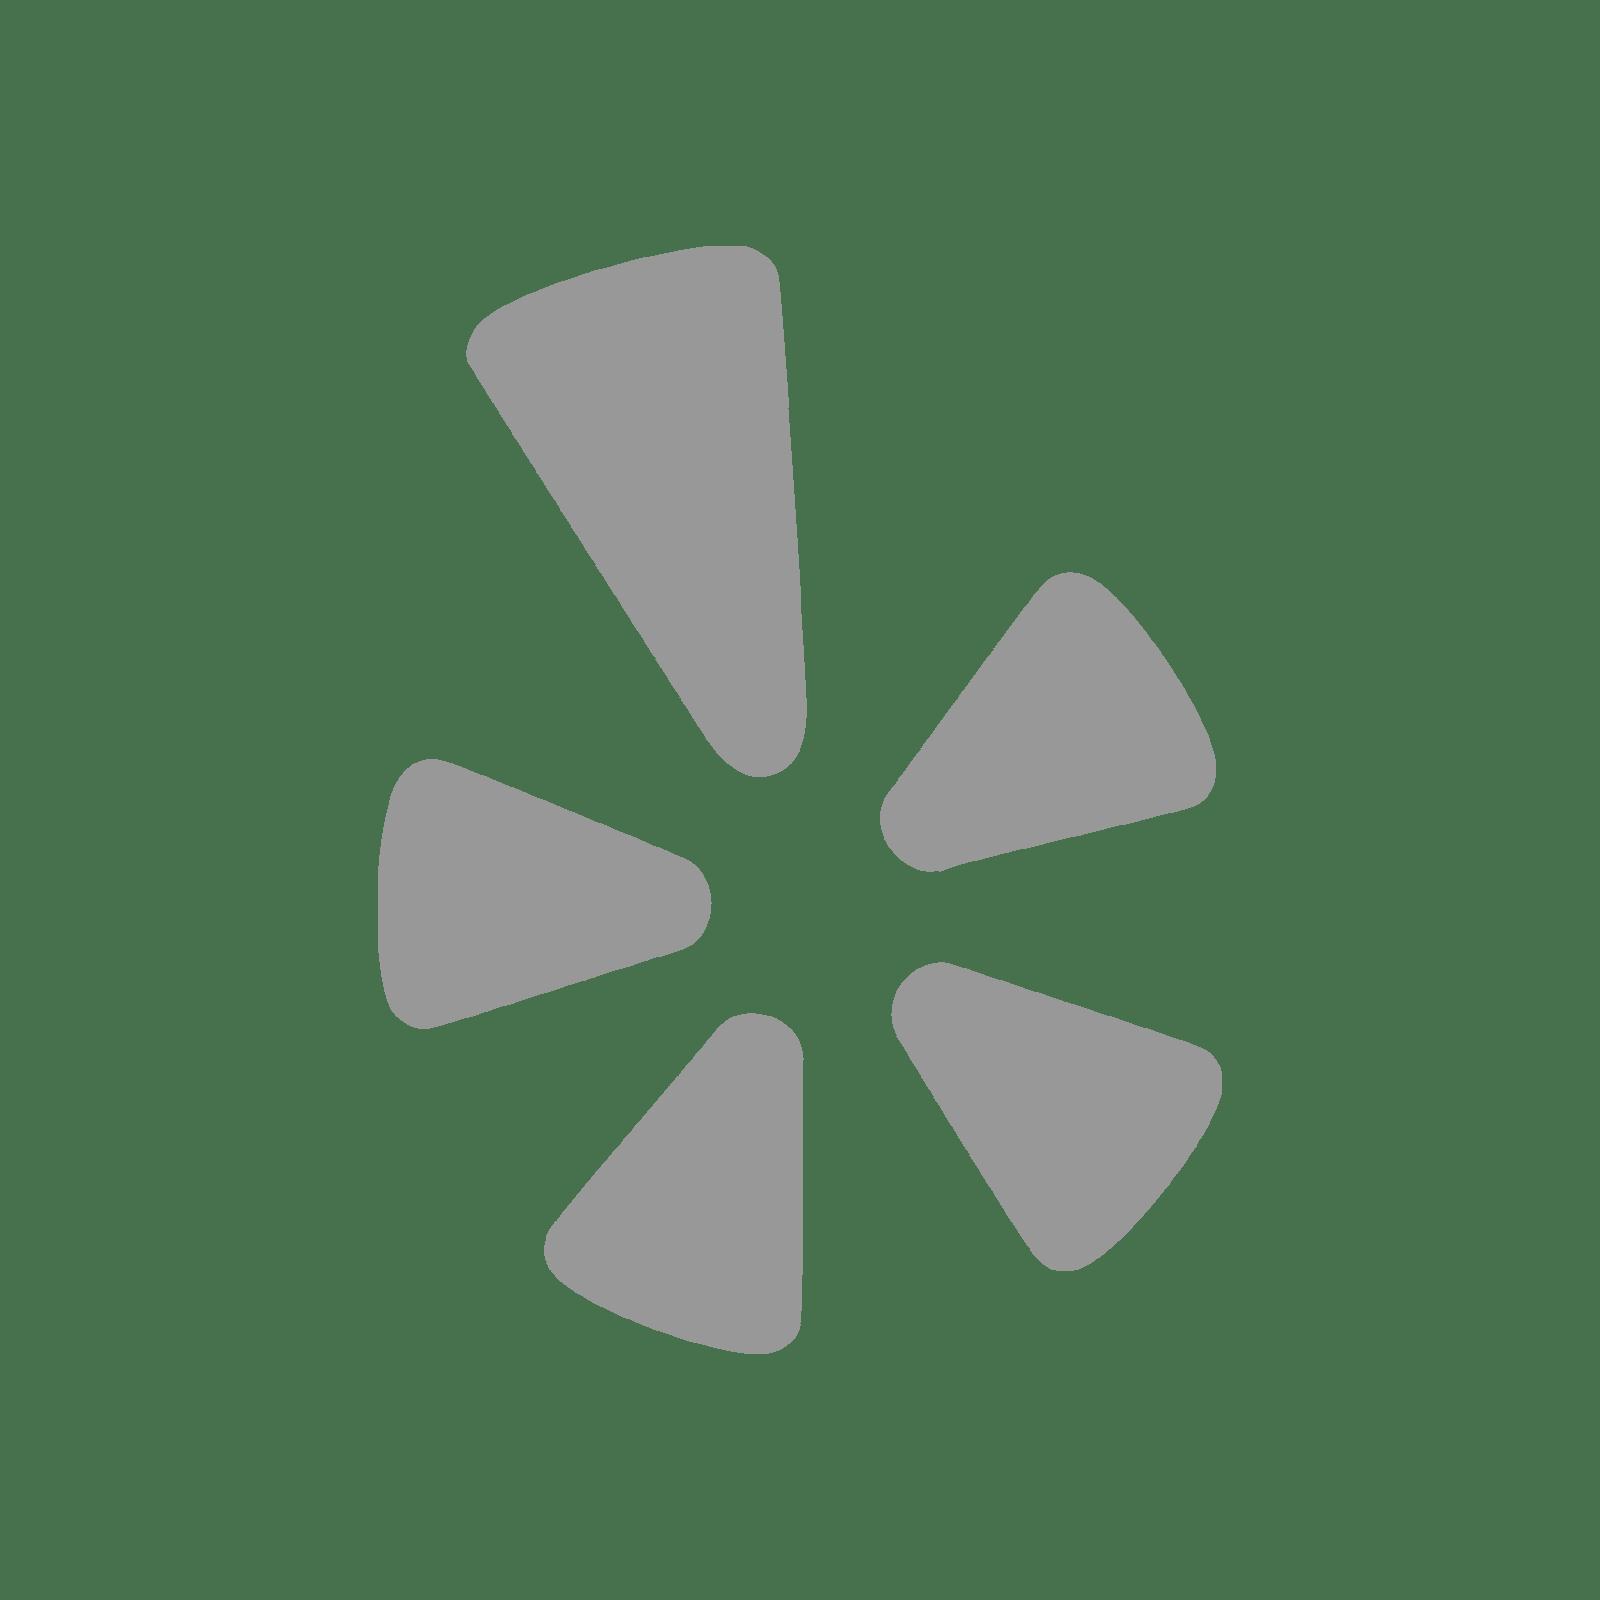 https://i1.wp.com/maukamakai.madebyscott.com/wp-content/uploads/2018/09/yelp-logo.png?ssl=1